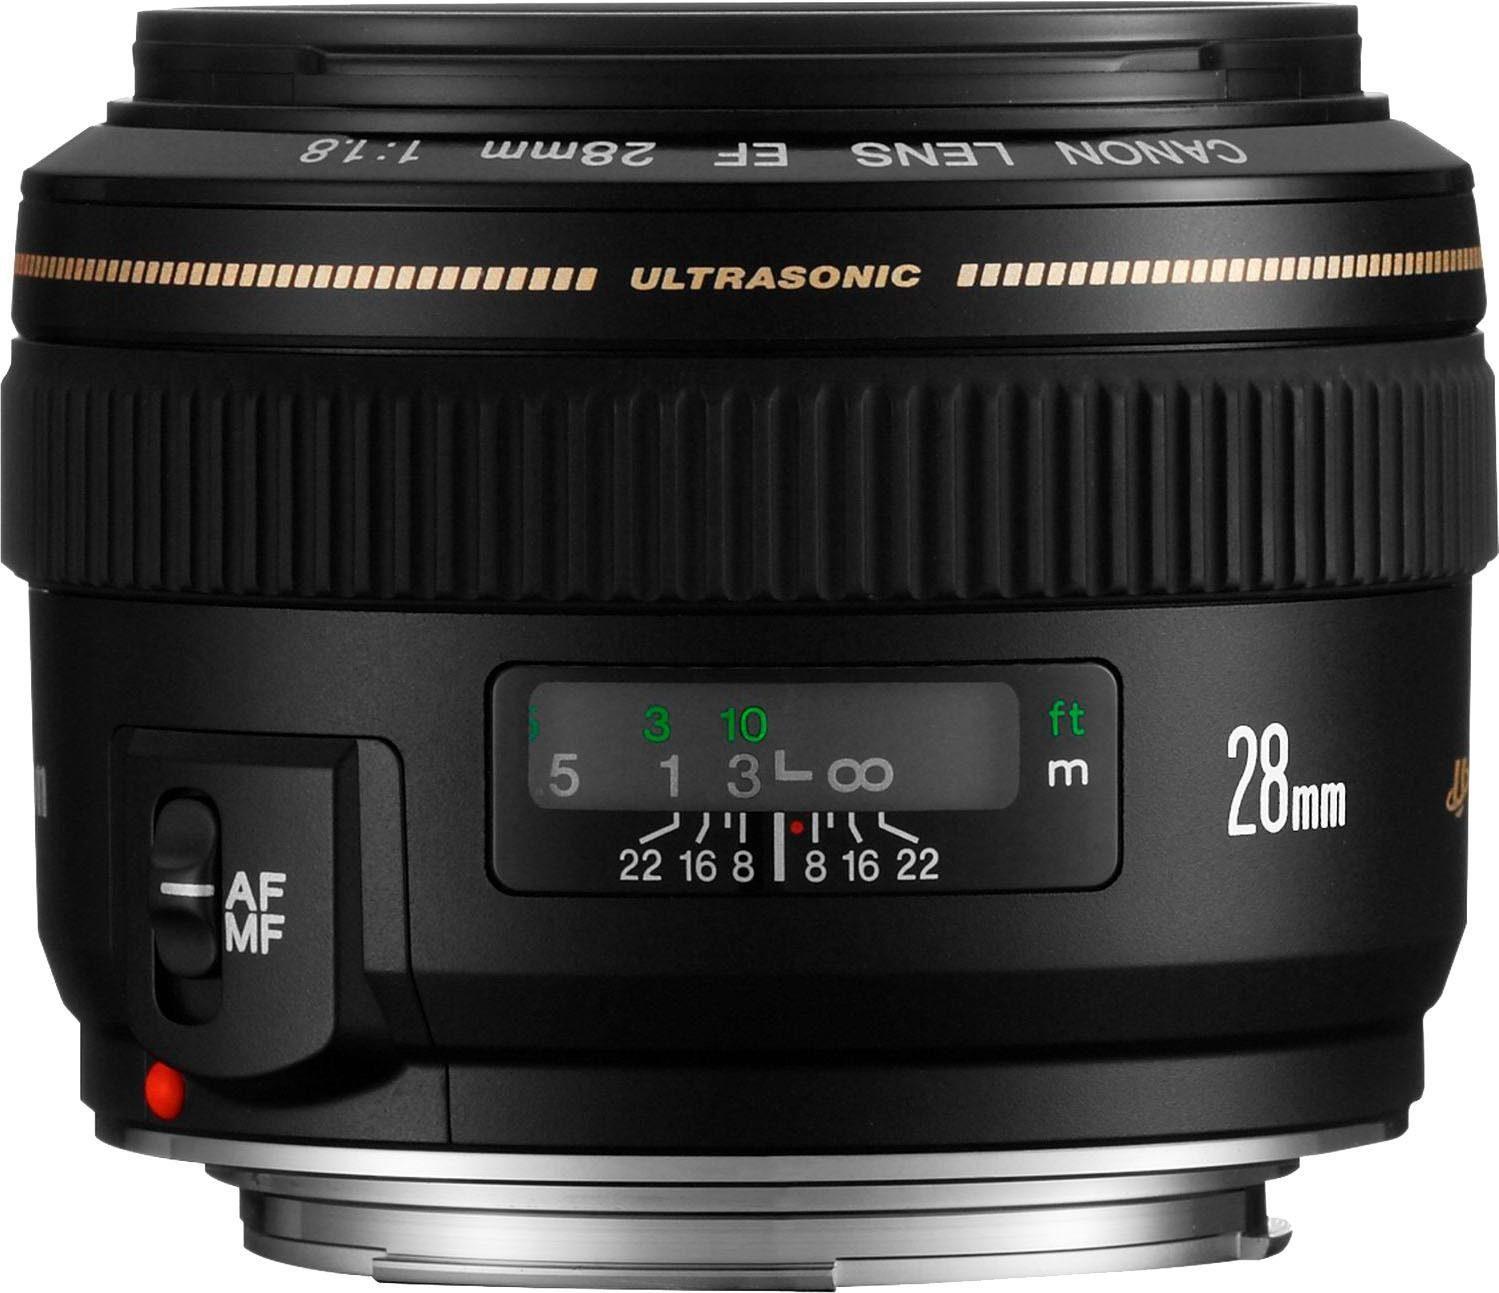 Canon »EF28MM F1.8 USM« Weitwinkelobjektiv